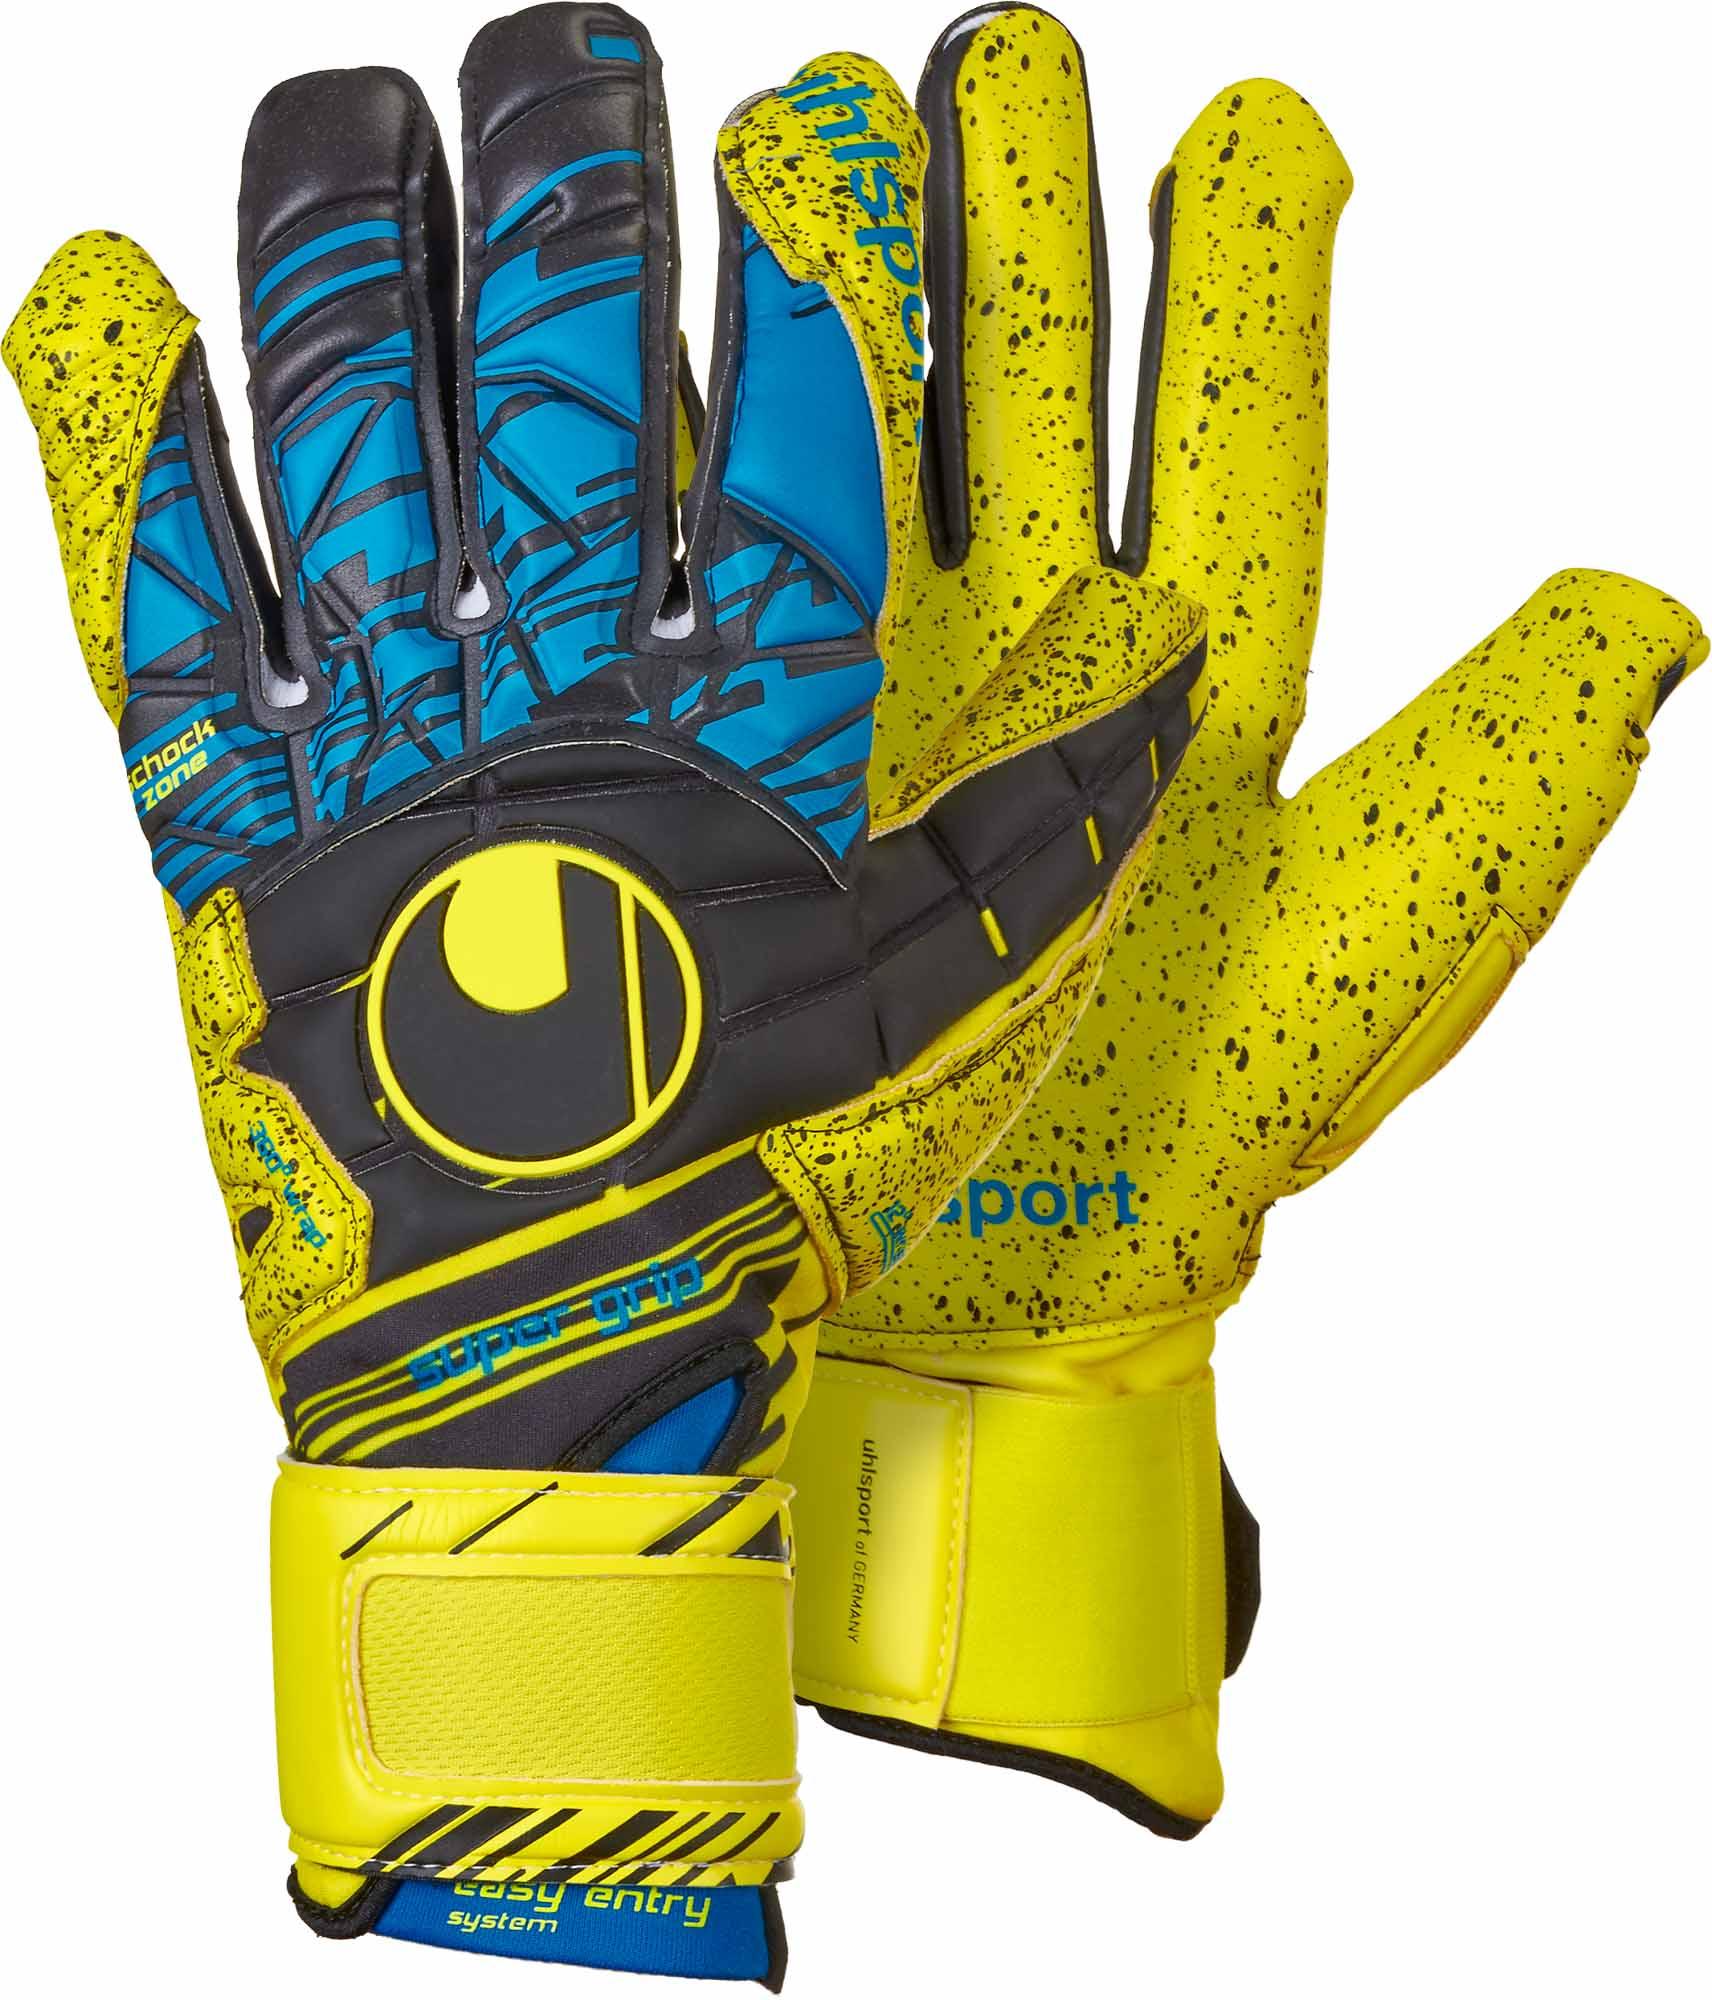 d661680ca Uhlsport Eliminator Supergrip HN Goalkeeper Gloves – Fluo Yellow   Black